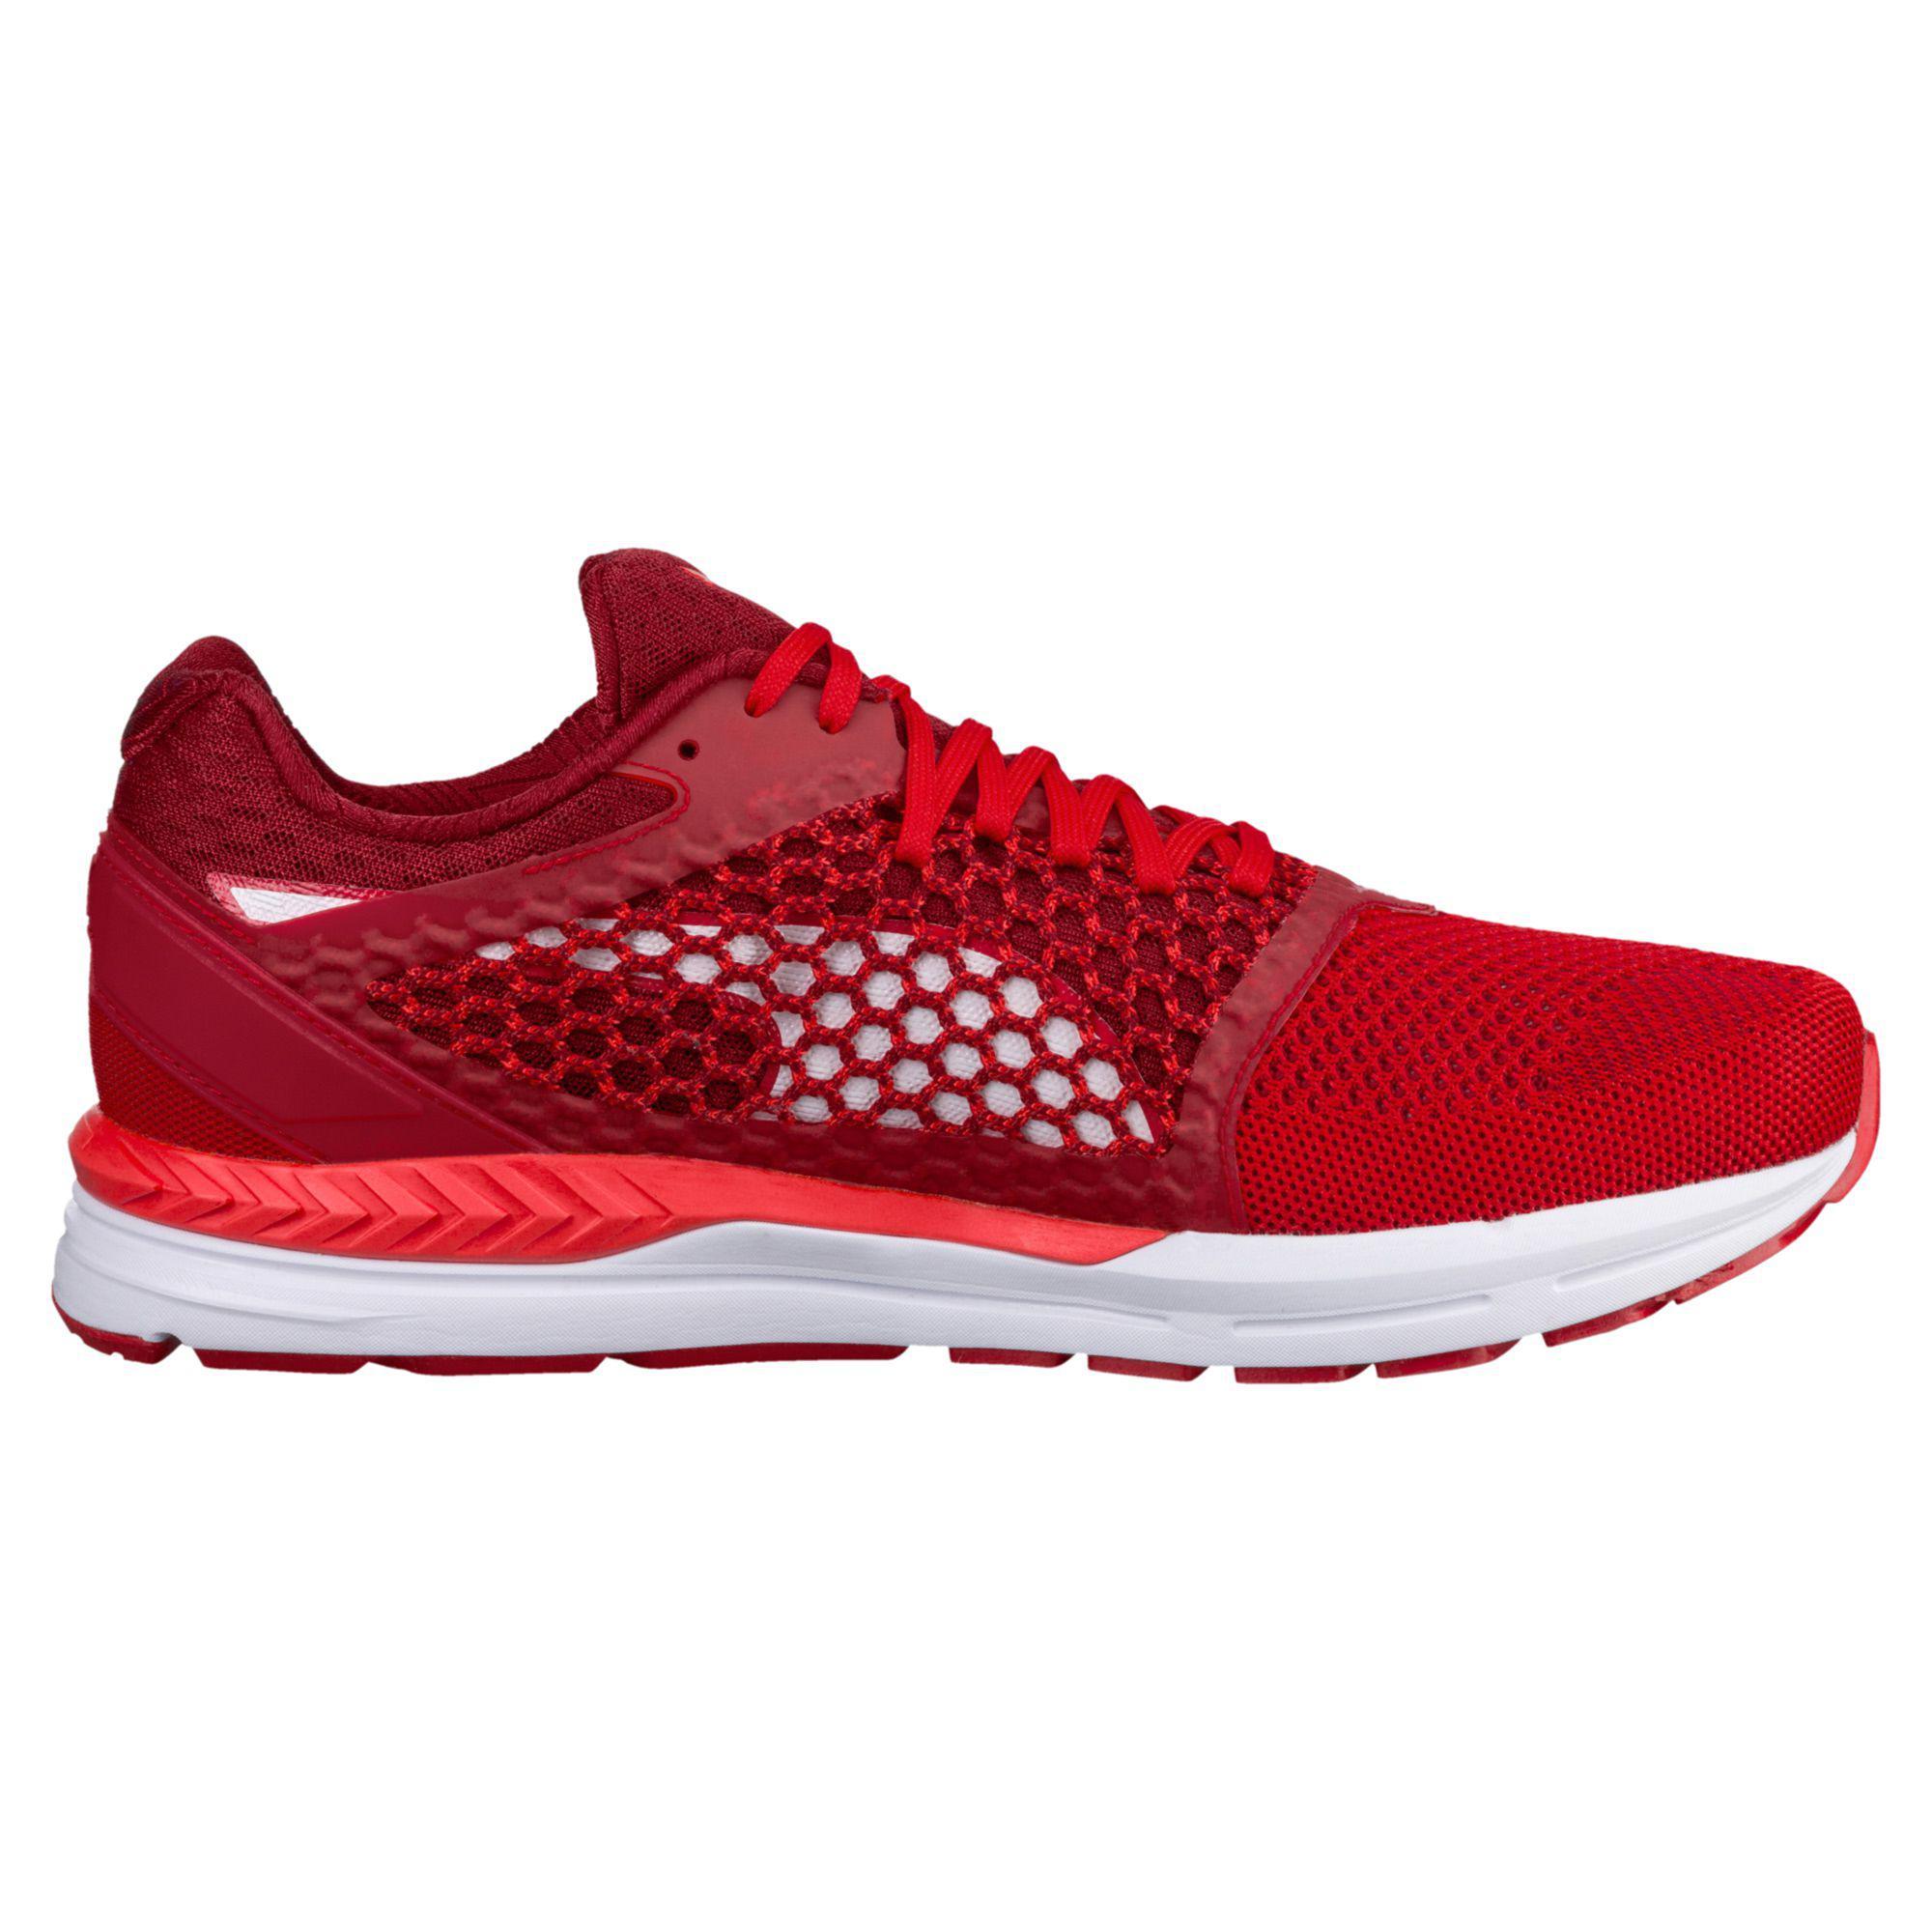 PUMA Speed 600 Ignite 3 Running Shoes